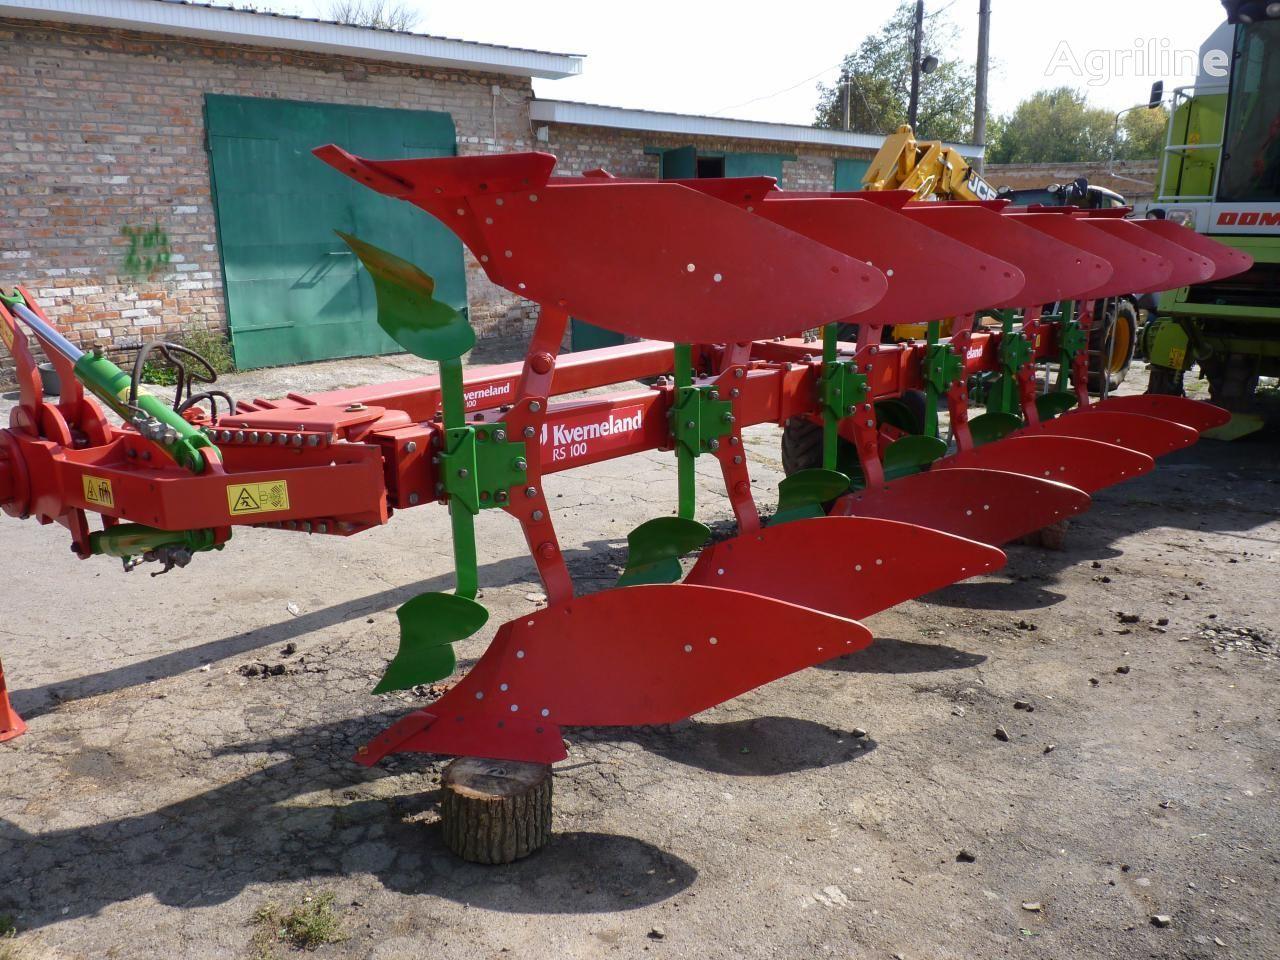 KVERNELAND RS 100 reversible plough